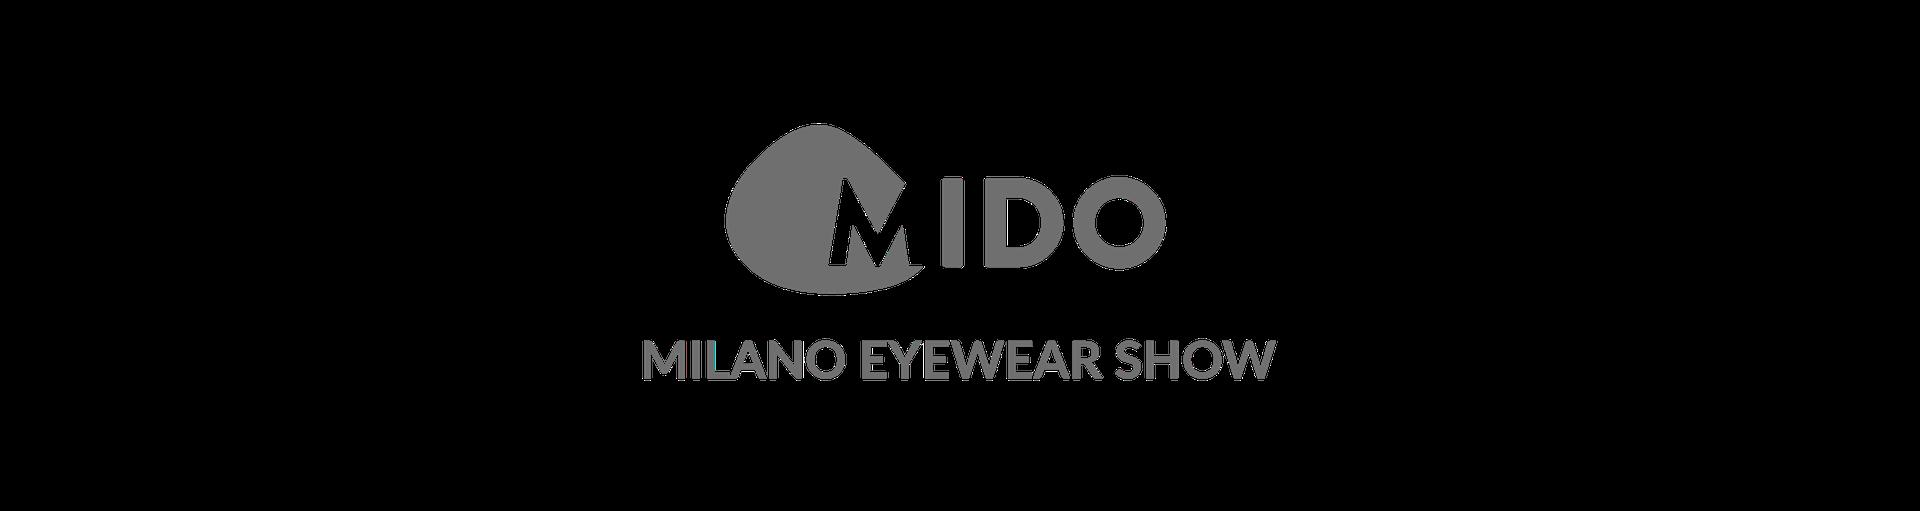 MIDO   Milano eyewear show